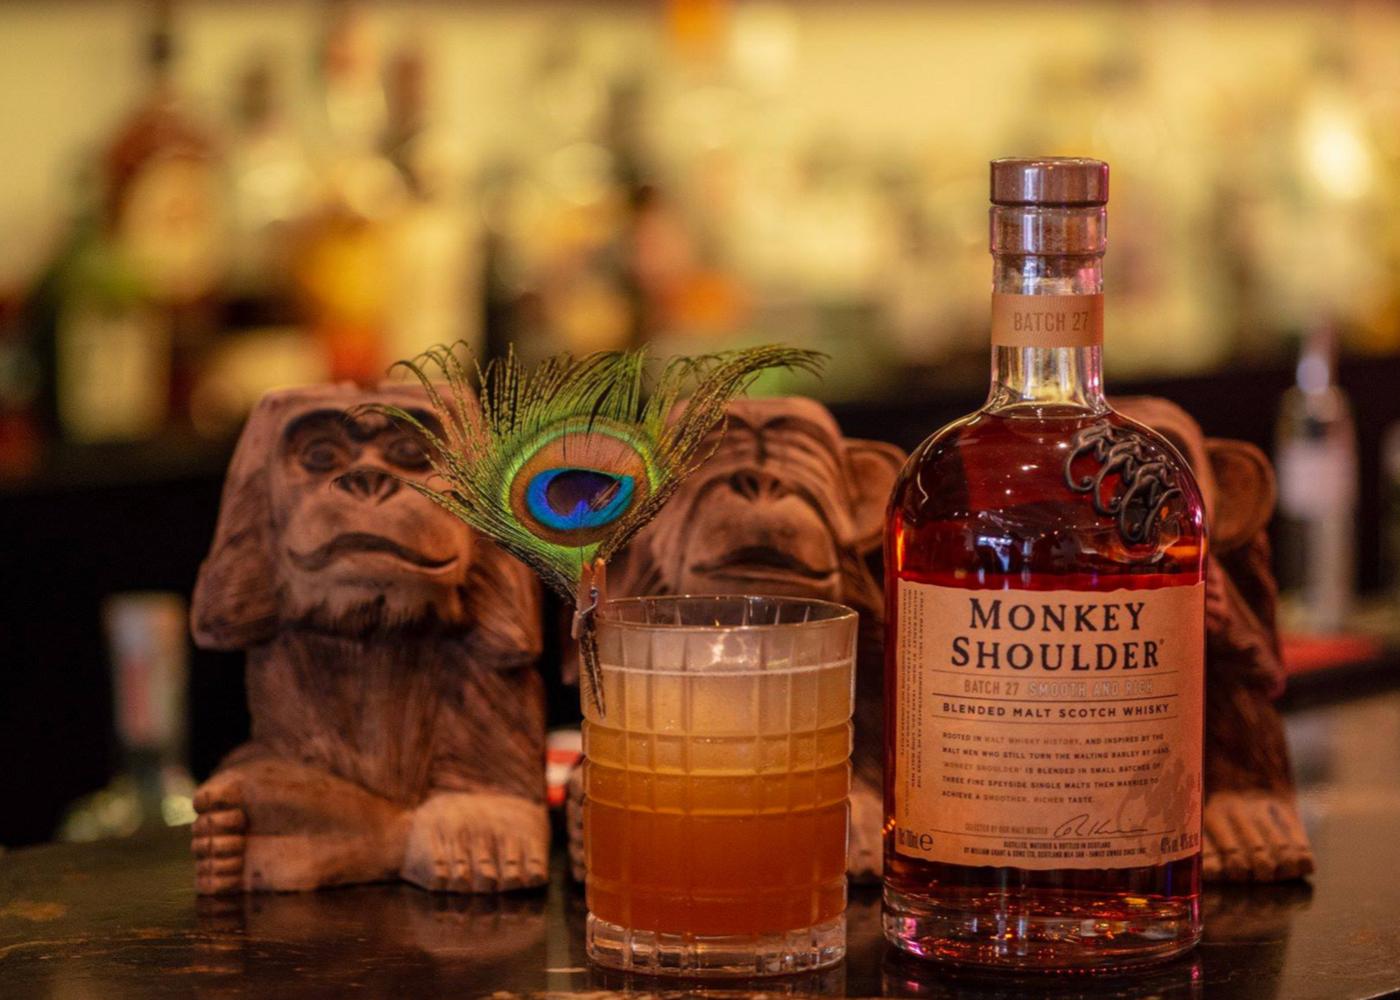 Indian-inspired bars Flying Monkey